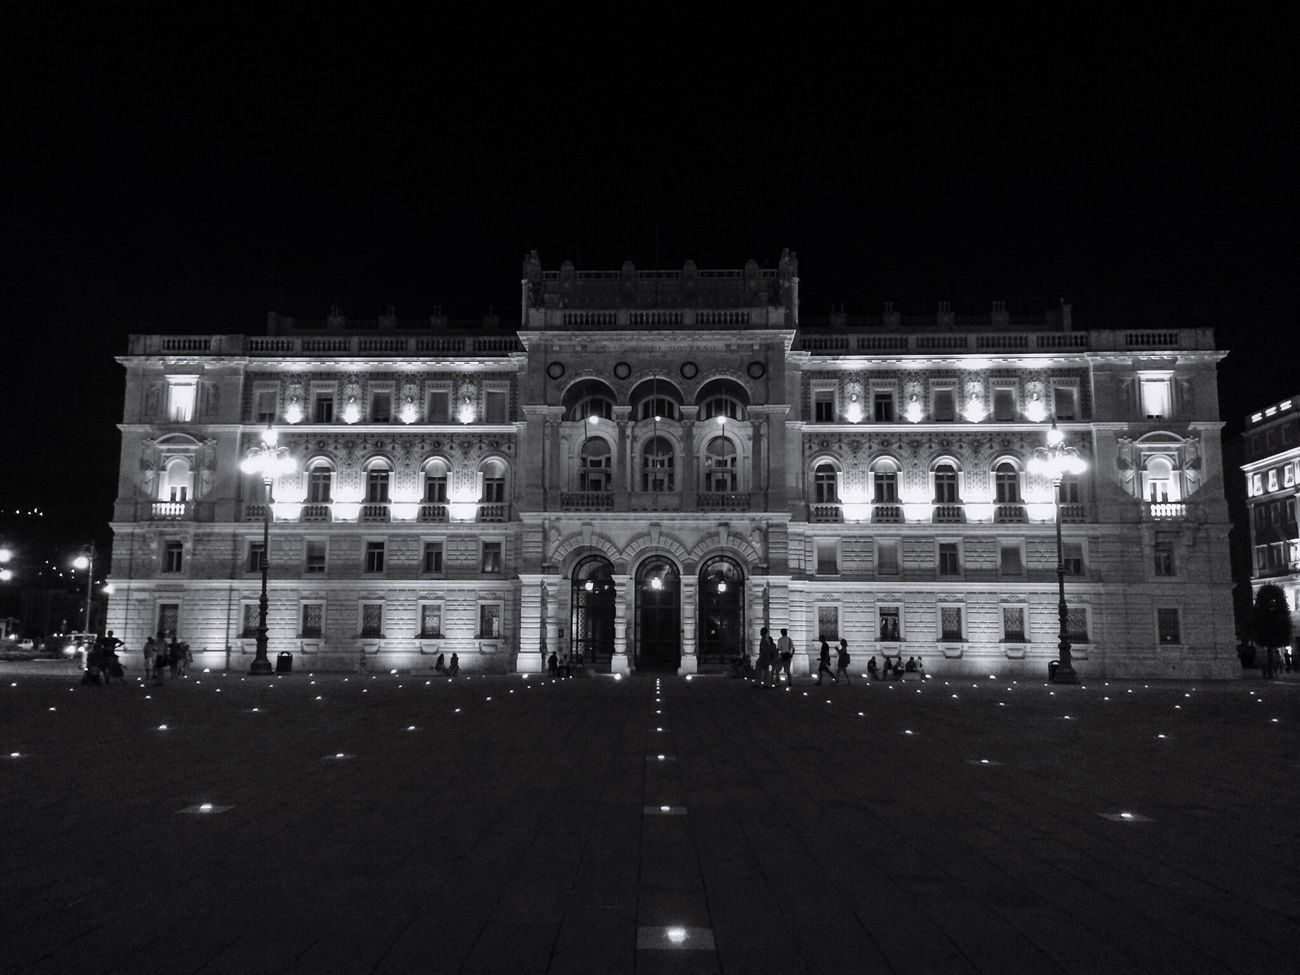 Black And White Bnw_friday_eyeemchallenge Bnw_nights Bnw_night Trieste